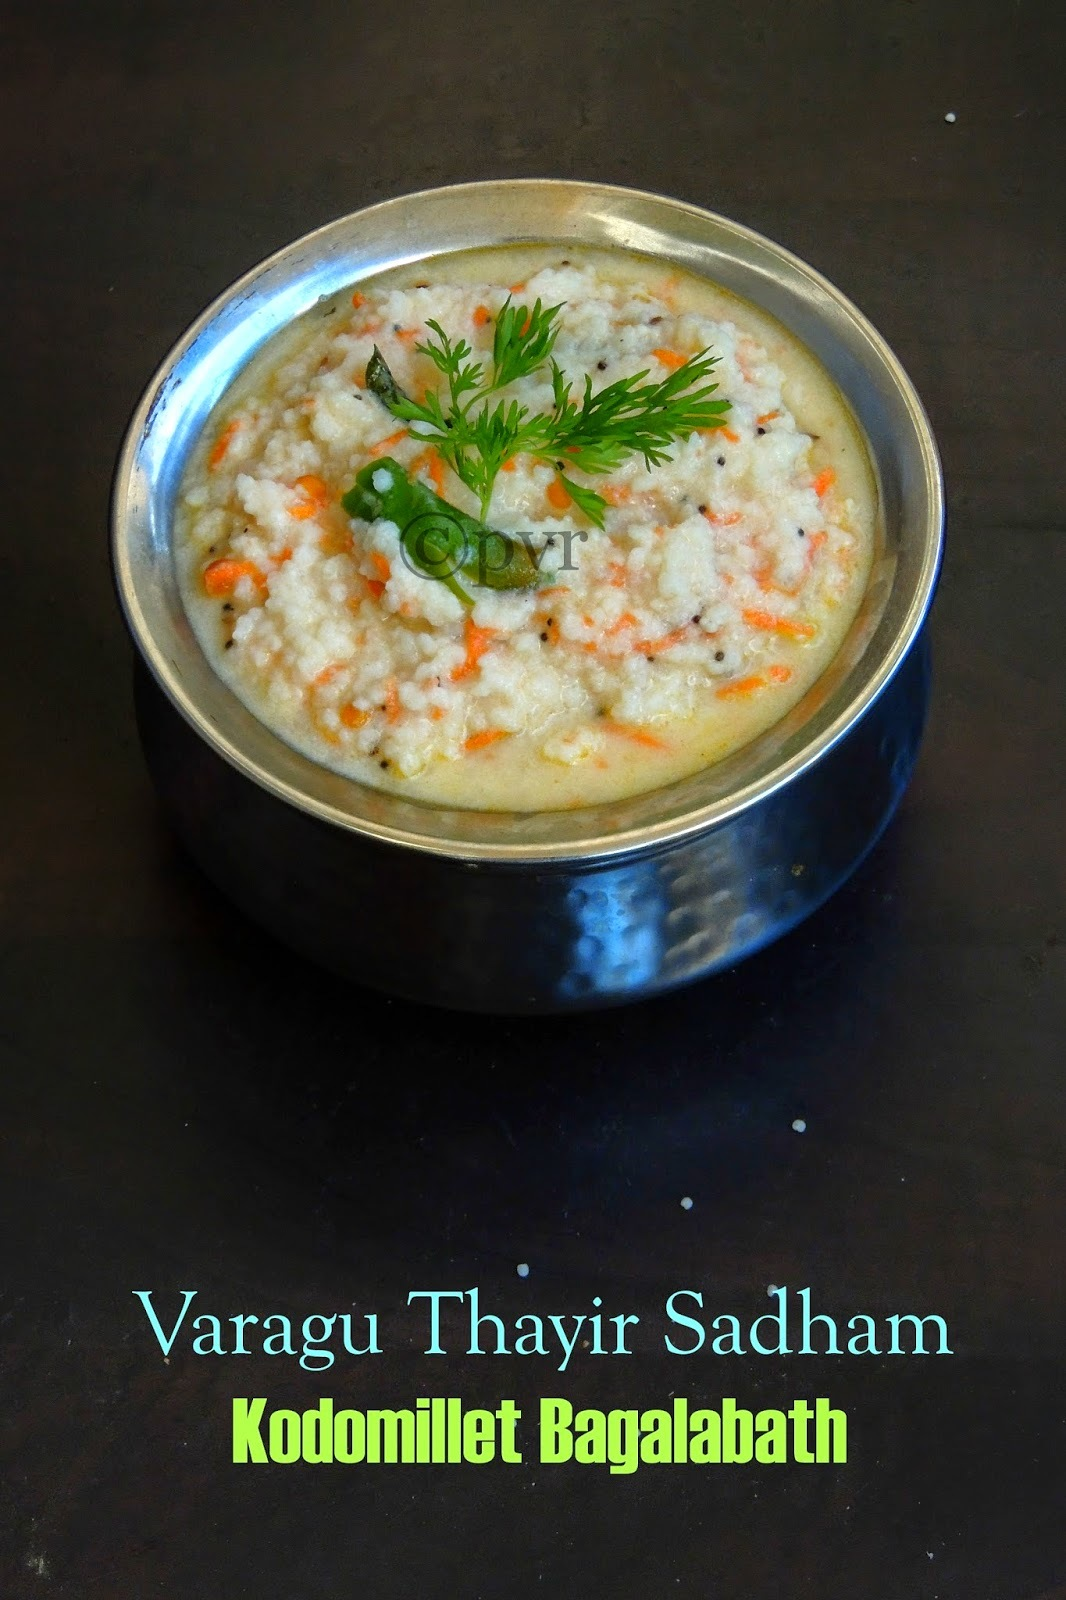 Kodomillet Bagala Bath/Kodomillet Curd Rice/Varagu Thayir Sadham